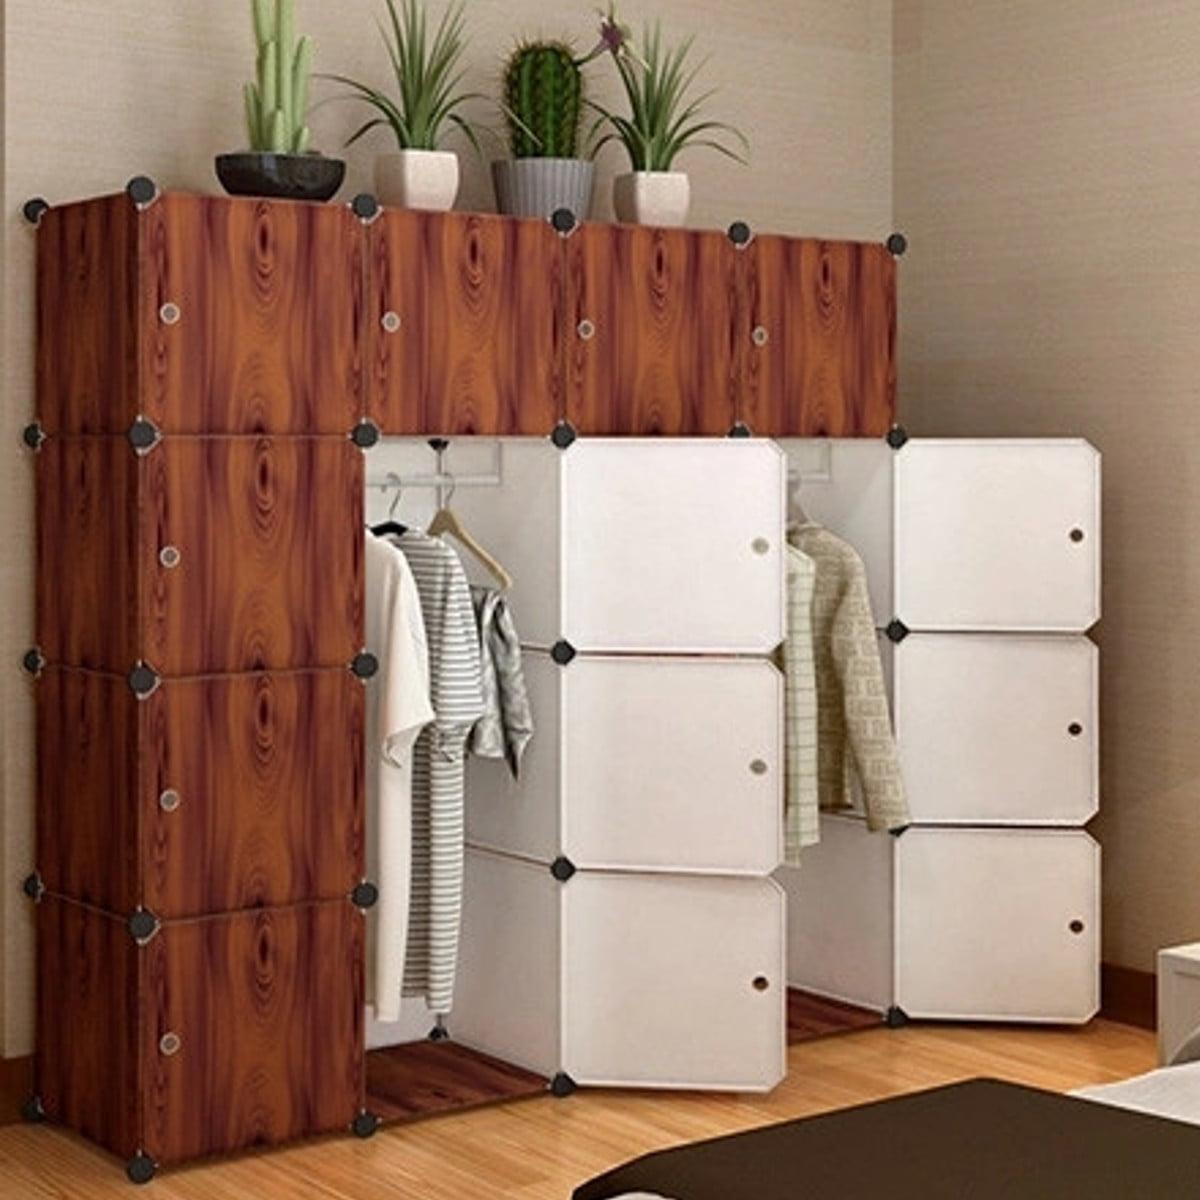 "42"" 9 Cube Portable Storage Box Clothes Wardrobe Cabinet Closet Storage Organizer Rack Shelves with Doors"